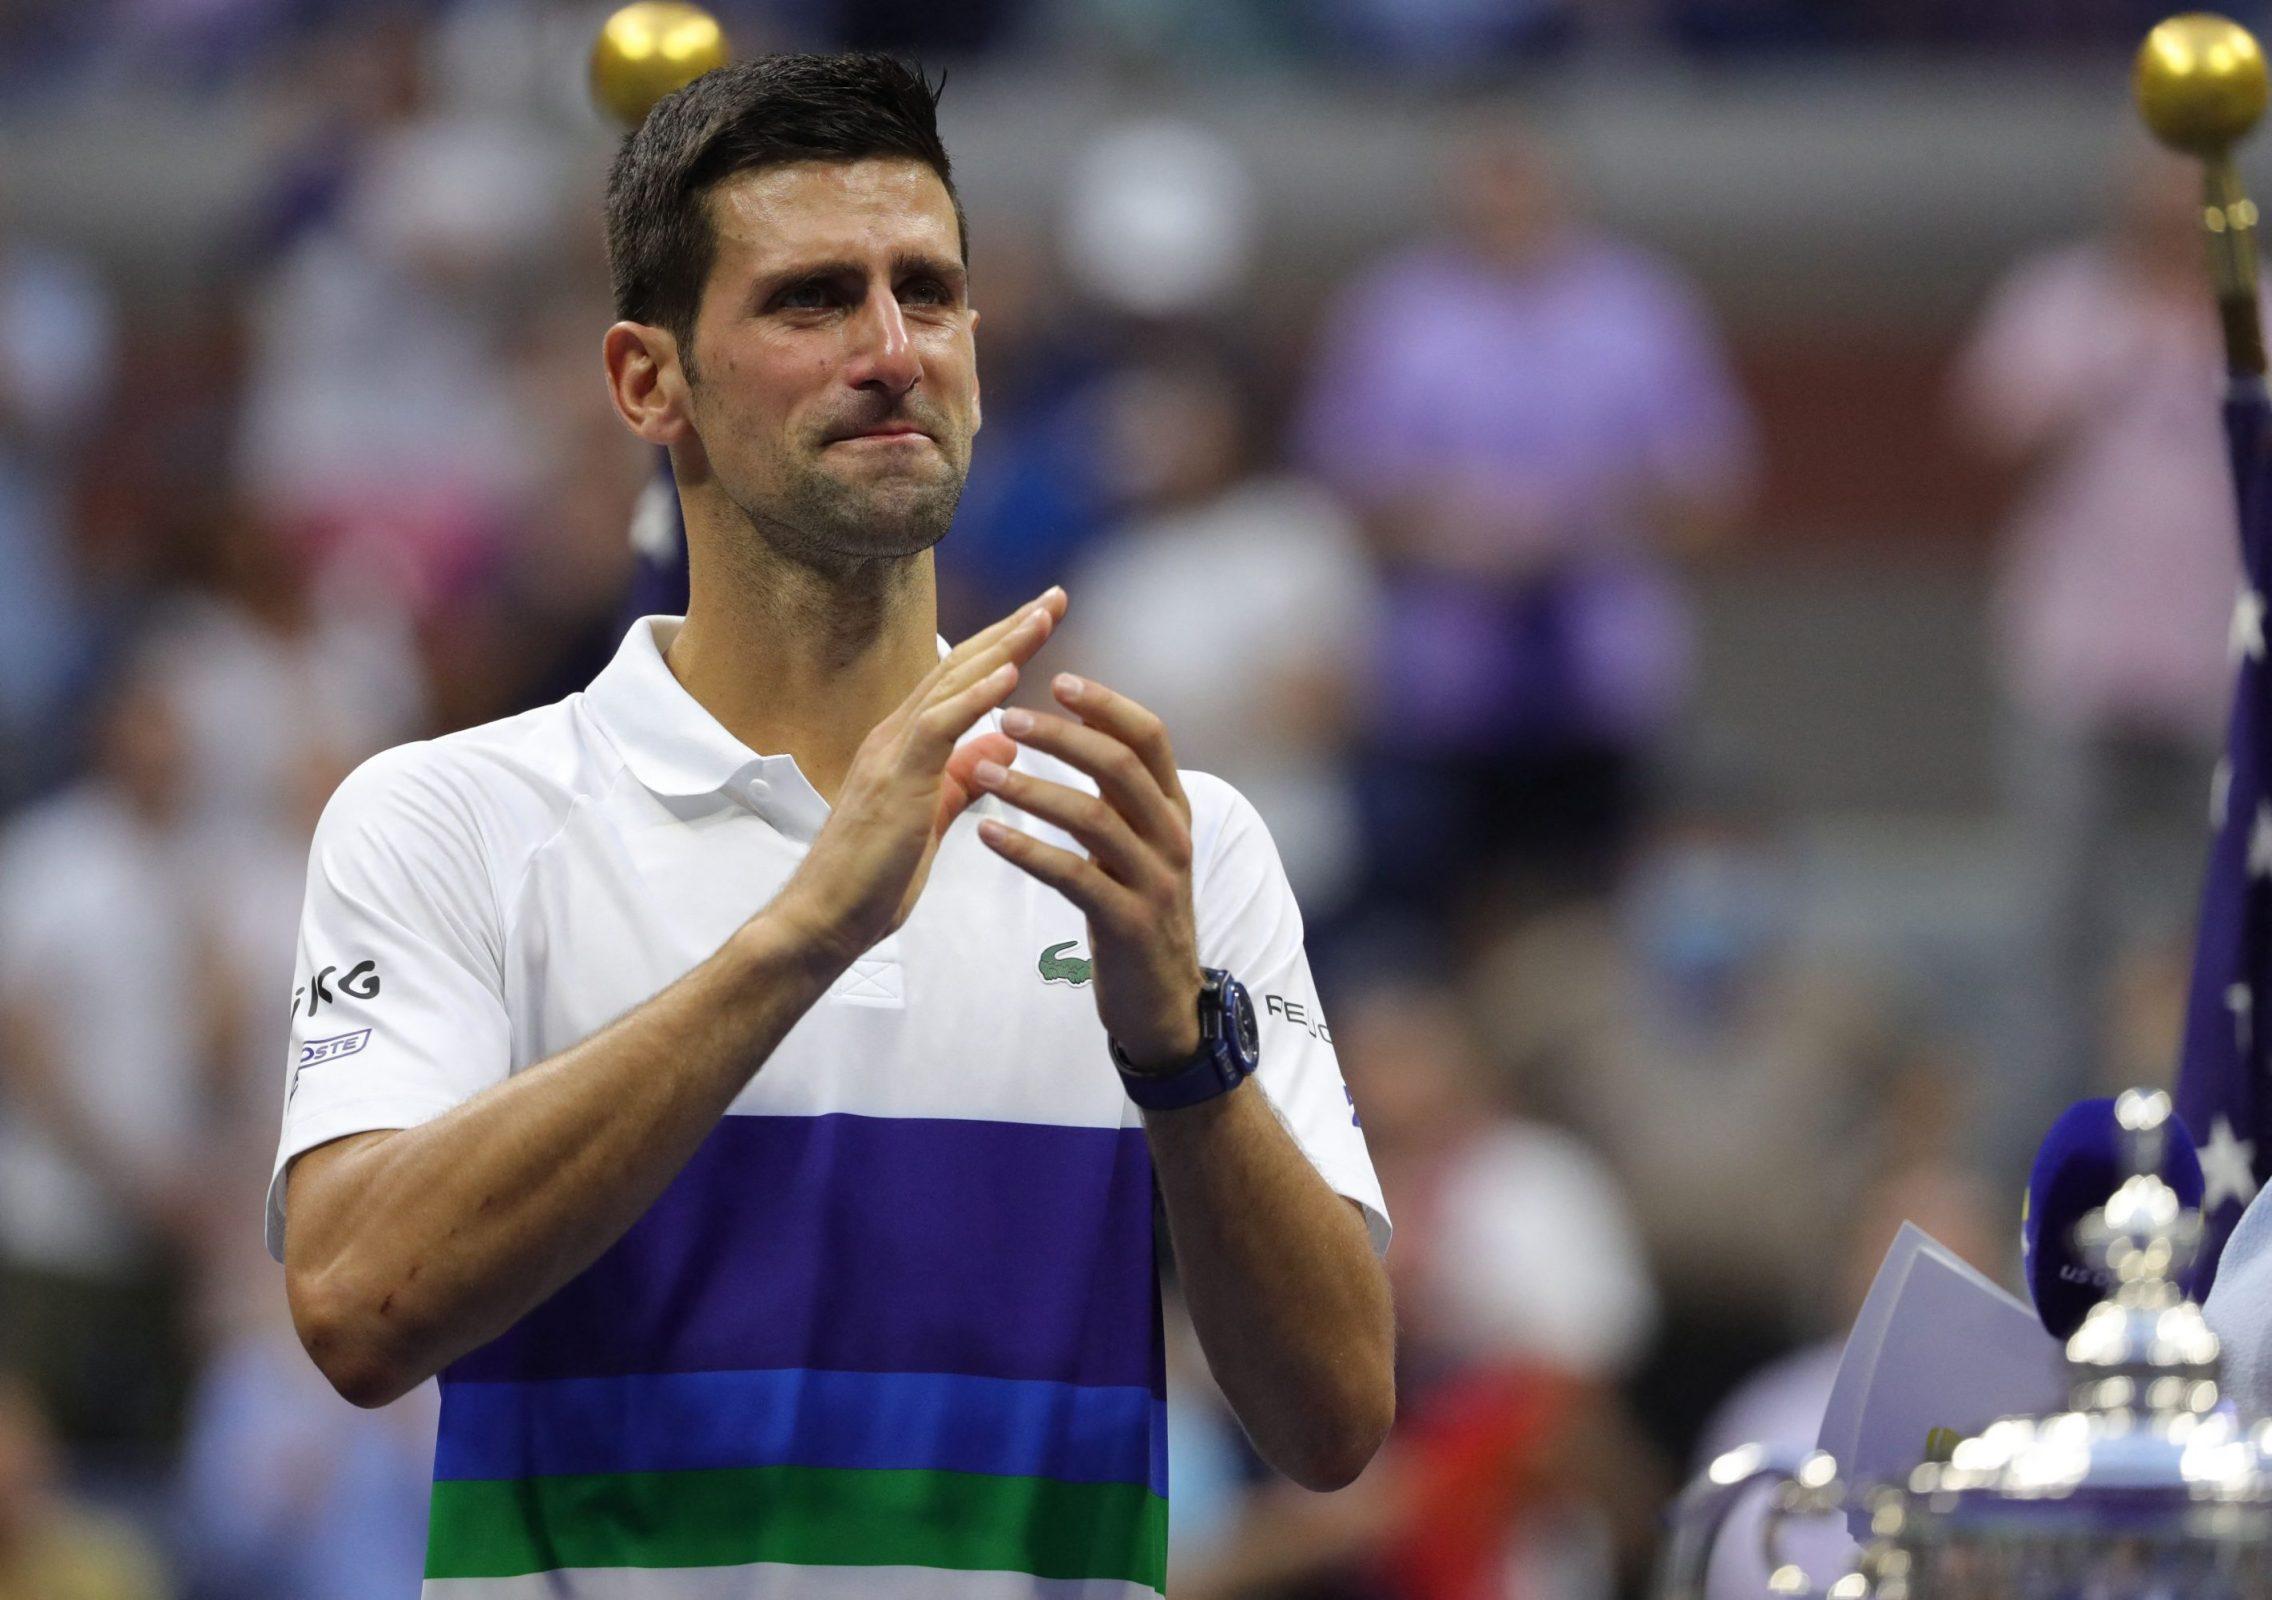 Novak Djokovic applauds the crowd